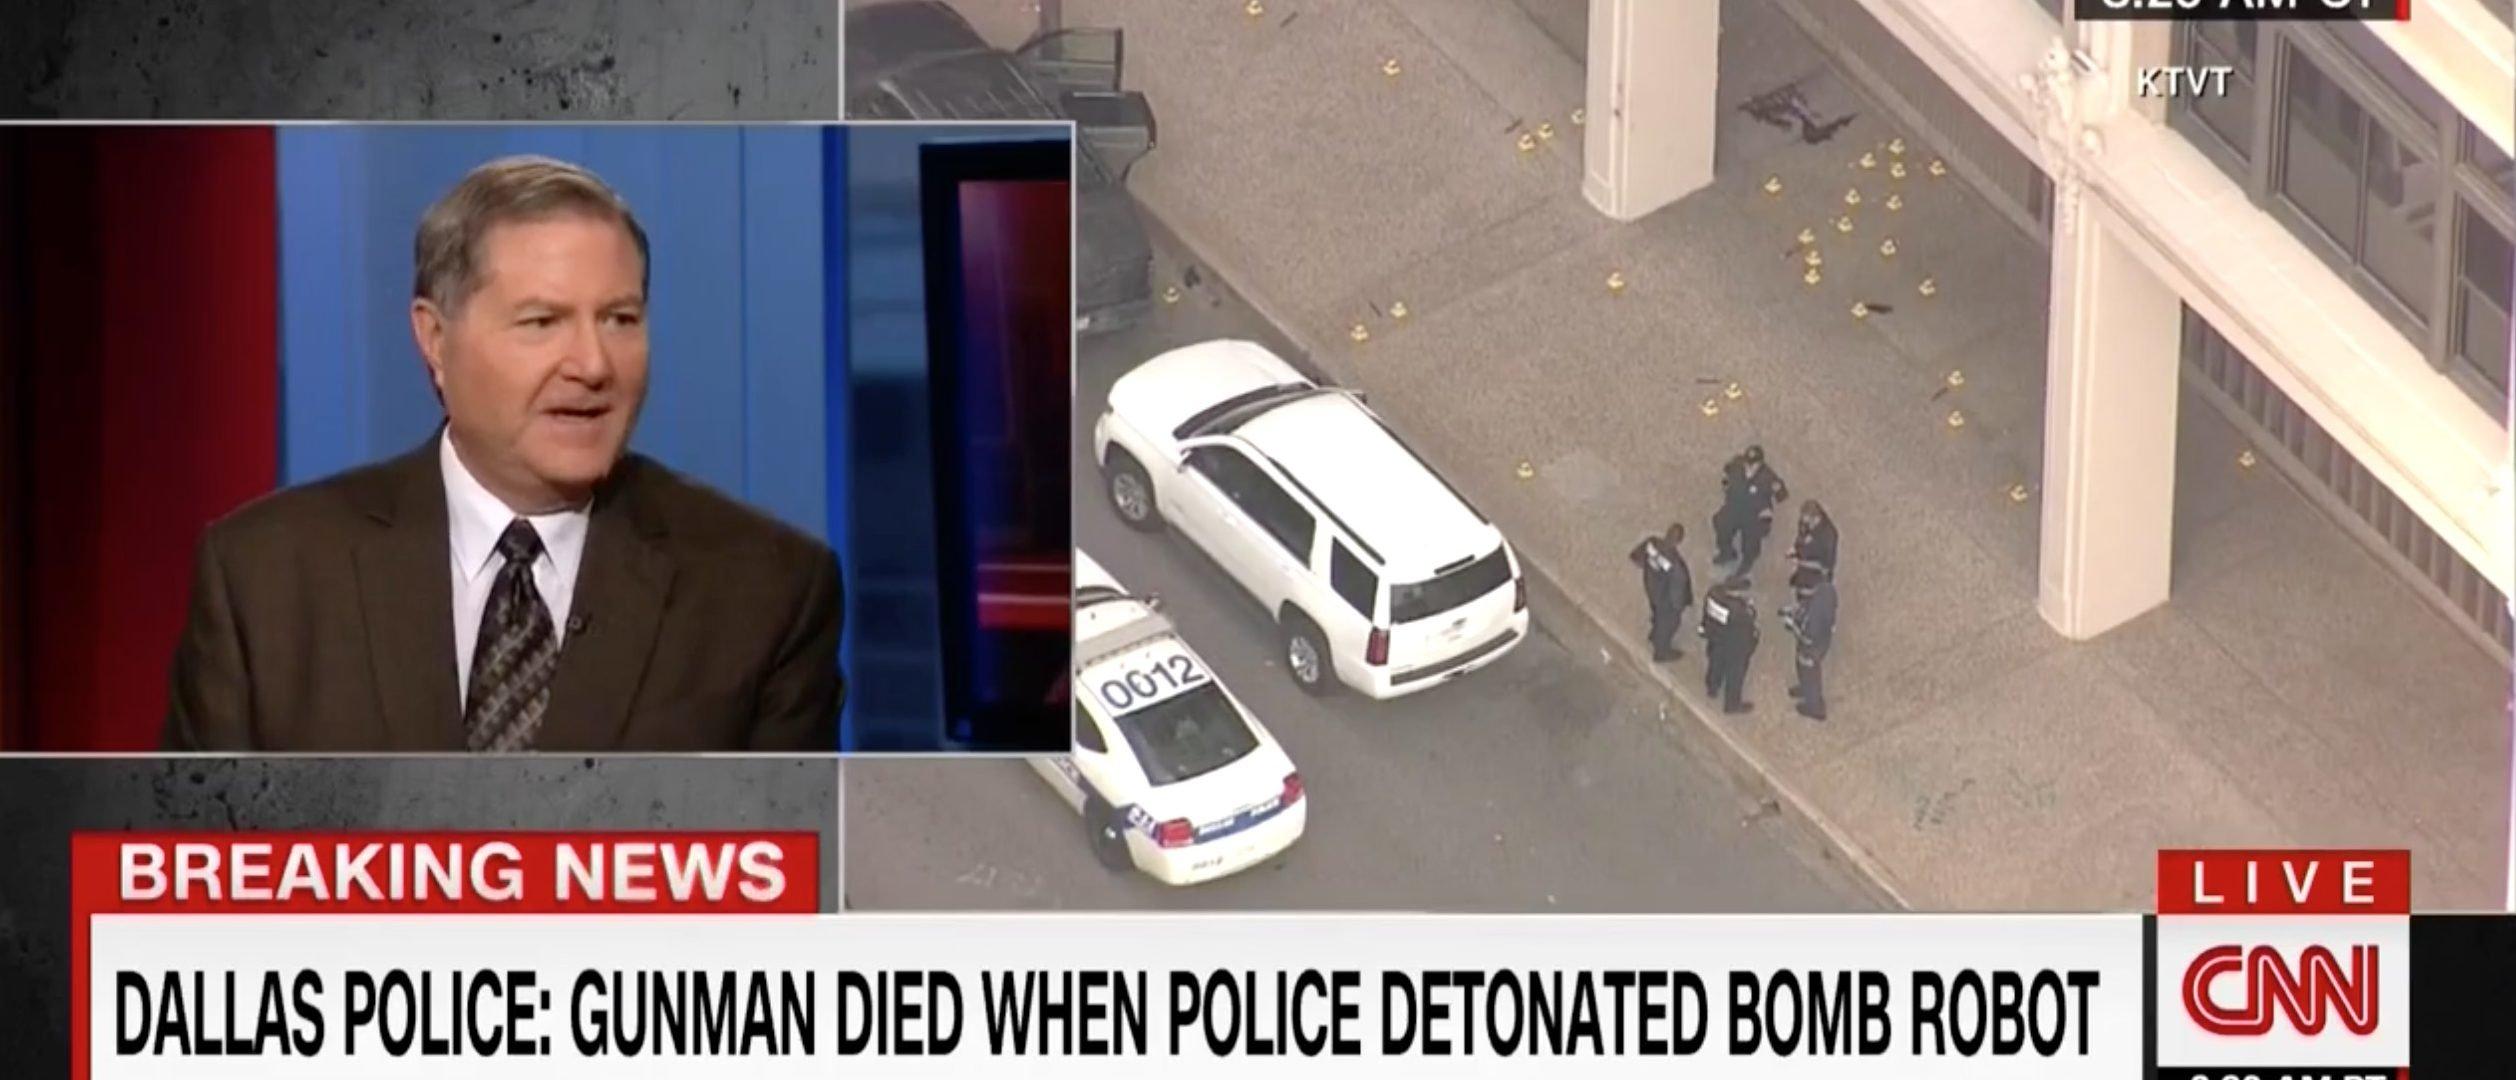 Tom Fuentes, Screen Grab CNN, 7-8-2016